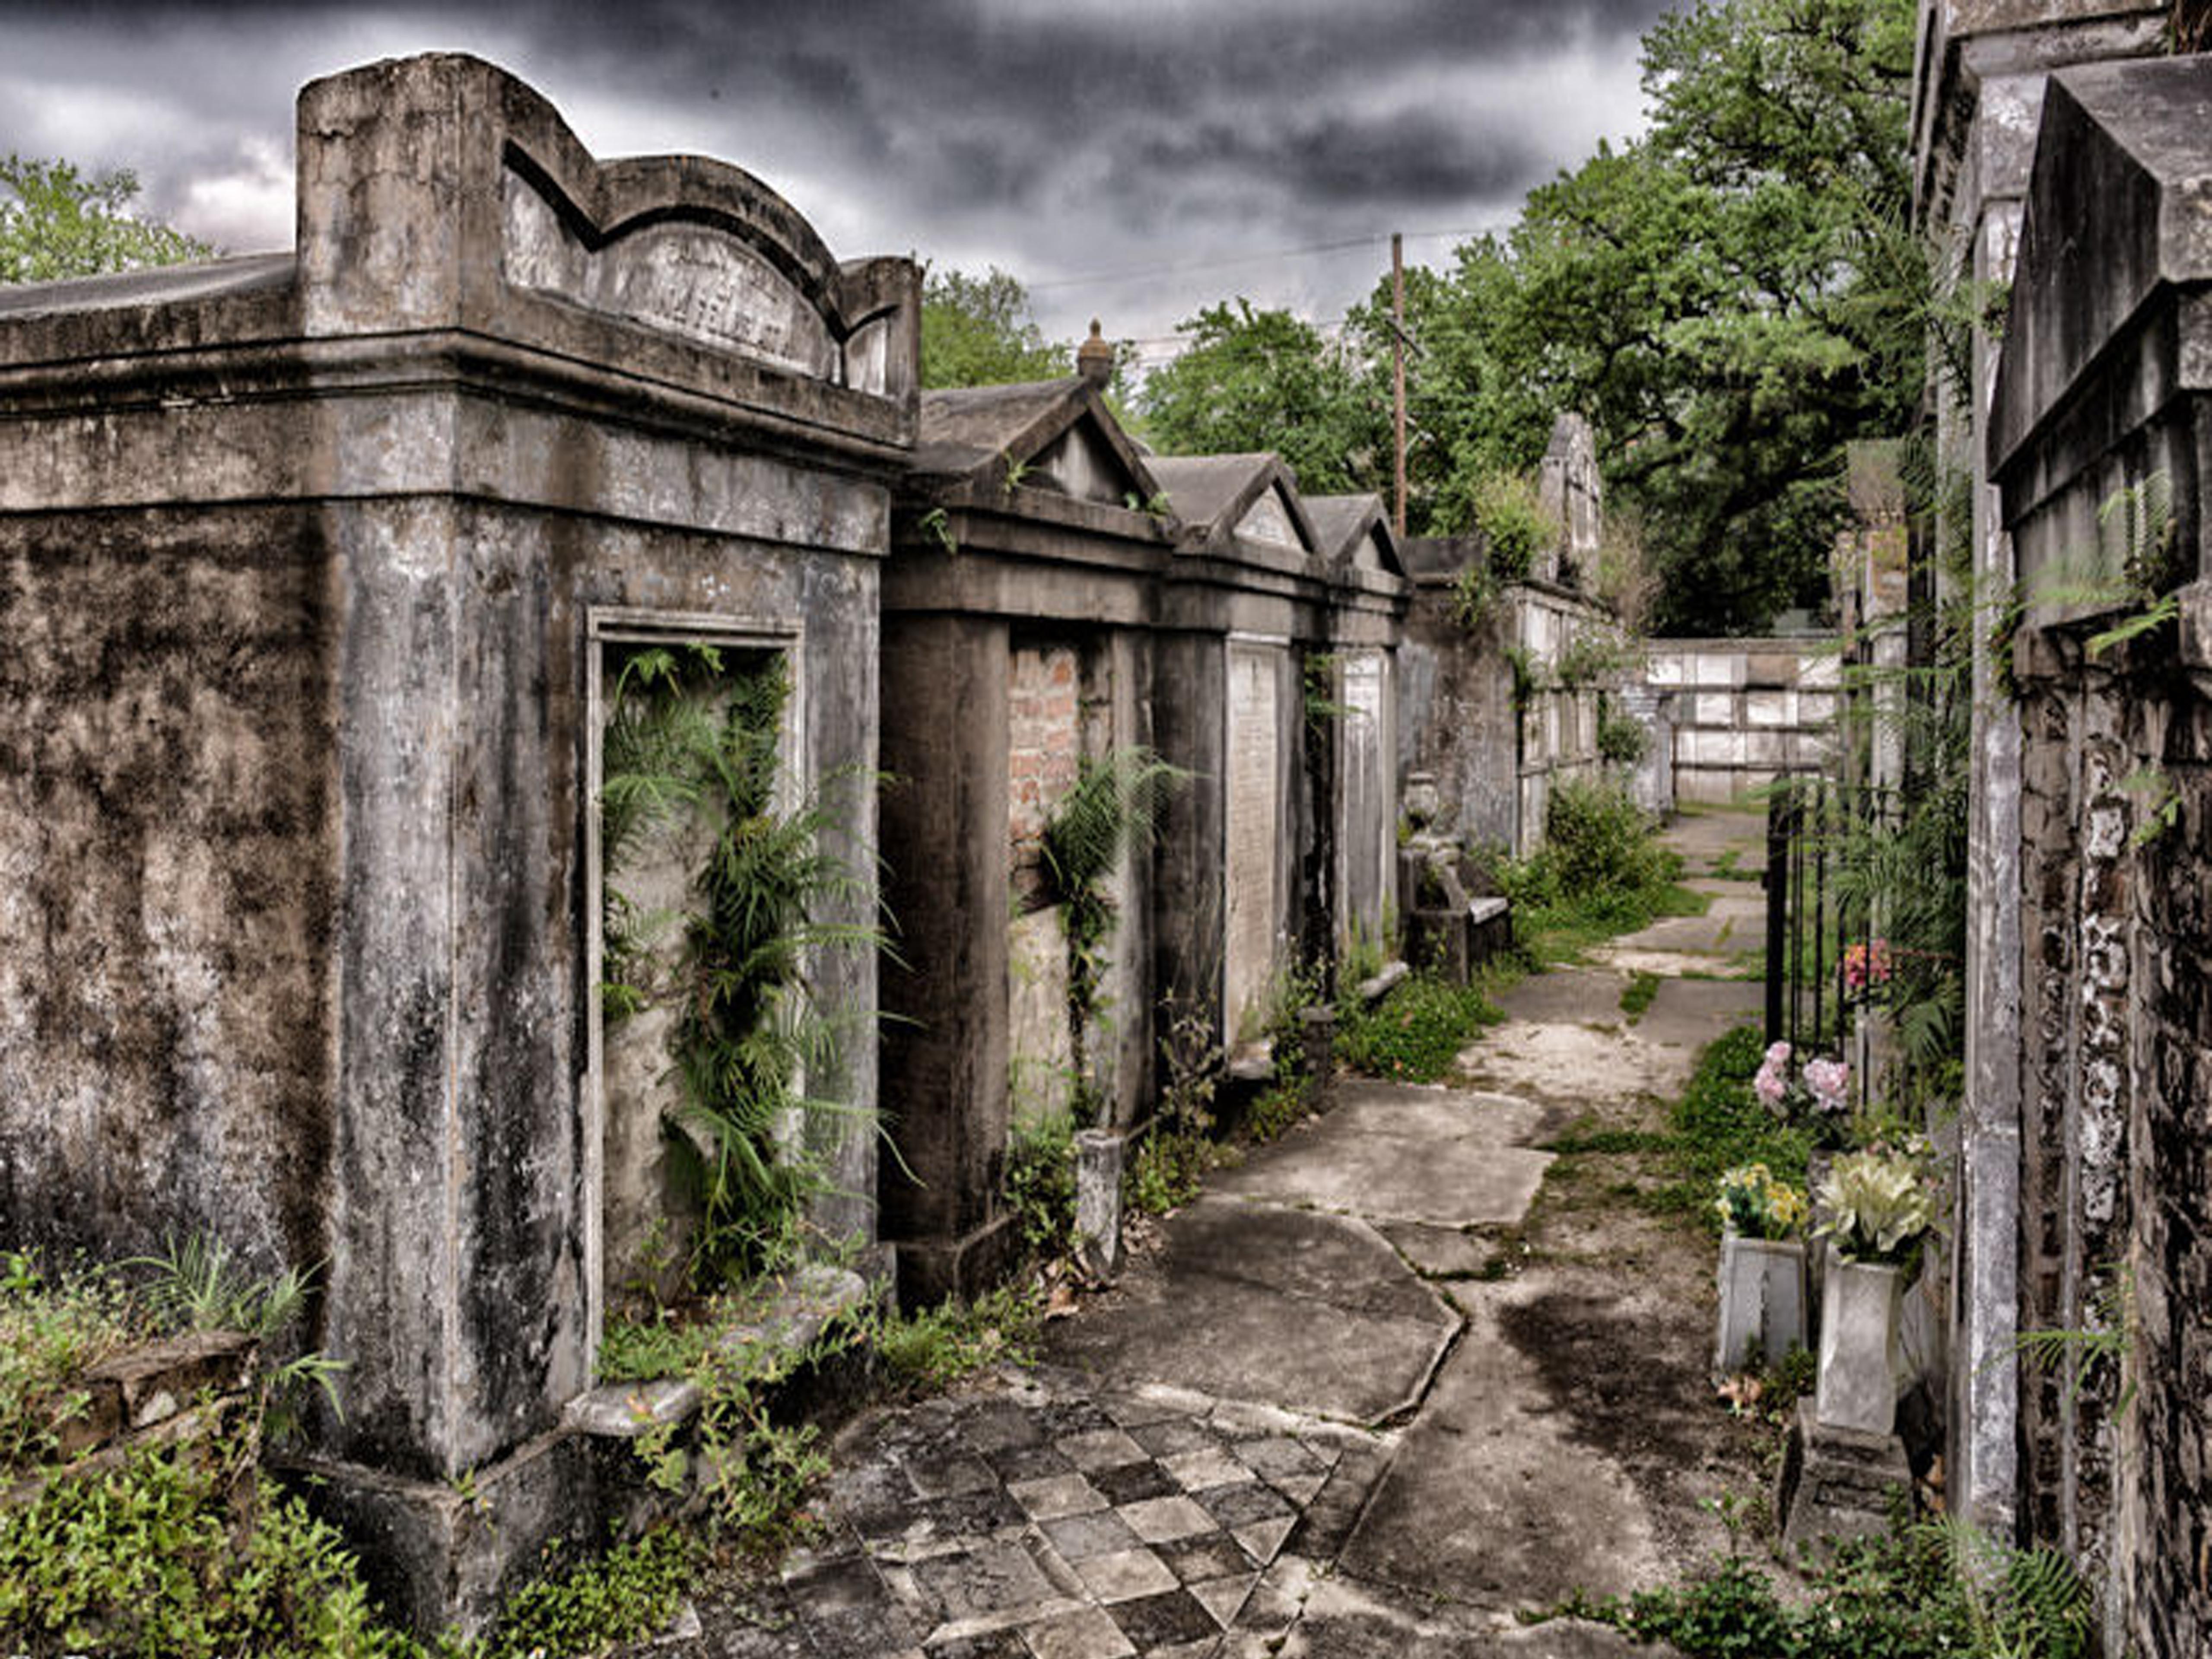 New Orleans Cemetery | New Orleans Grave Yard - Album on Imgur